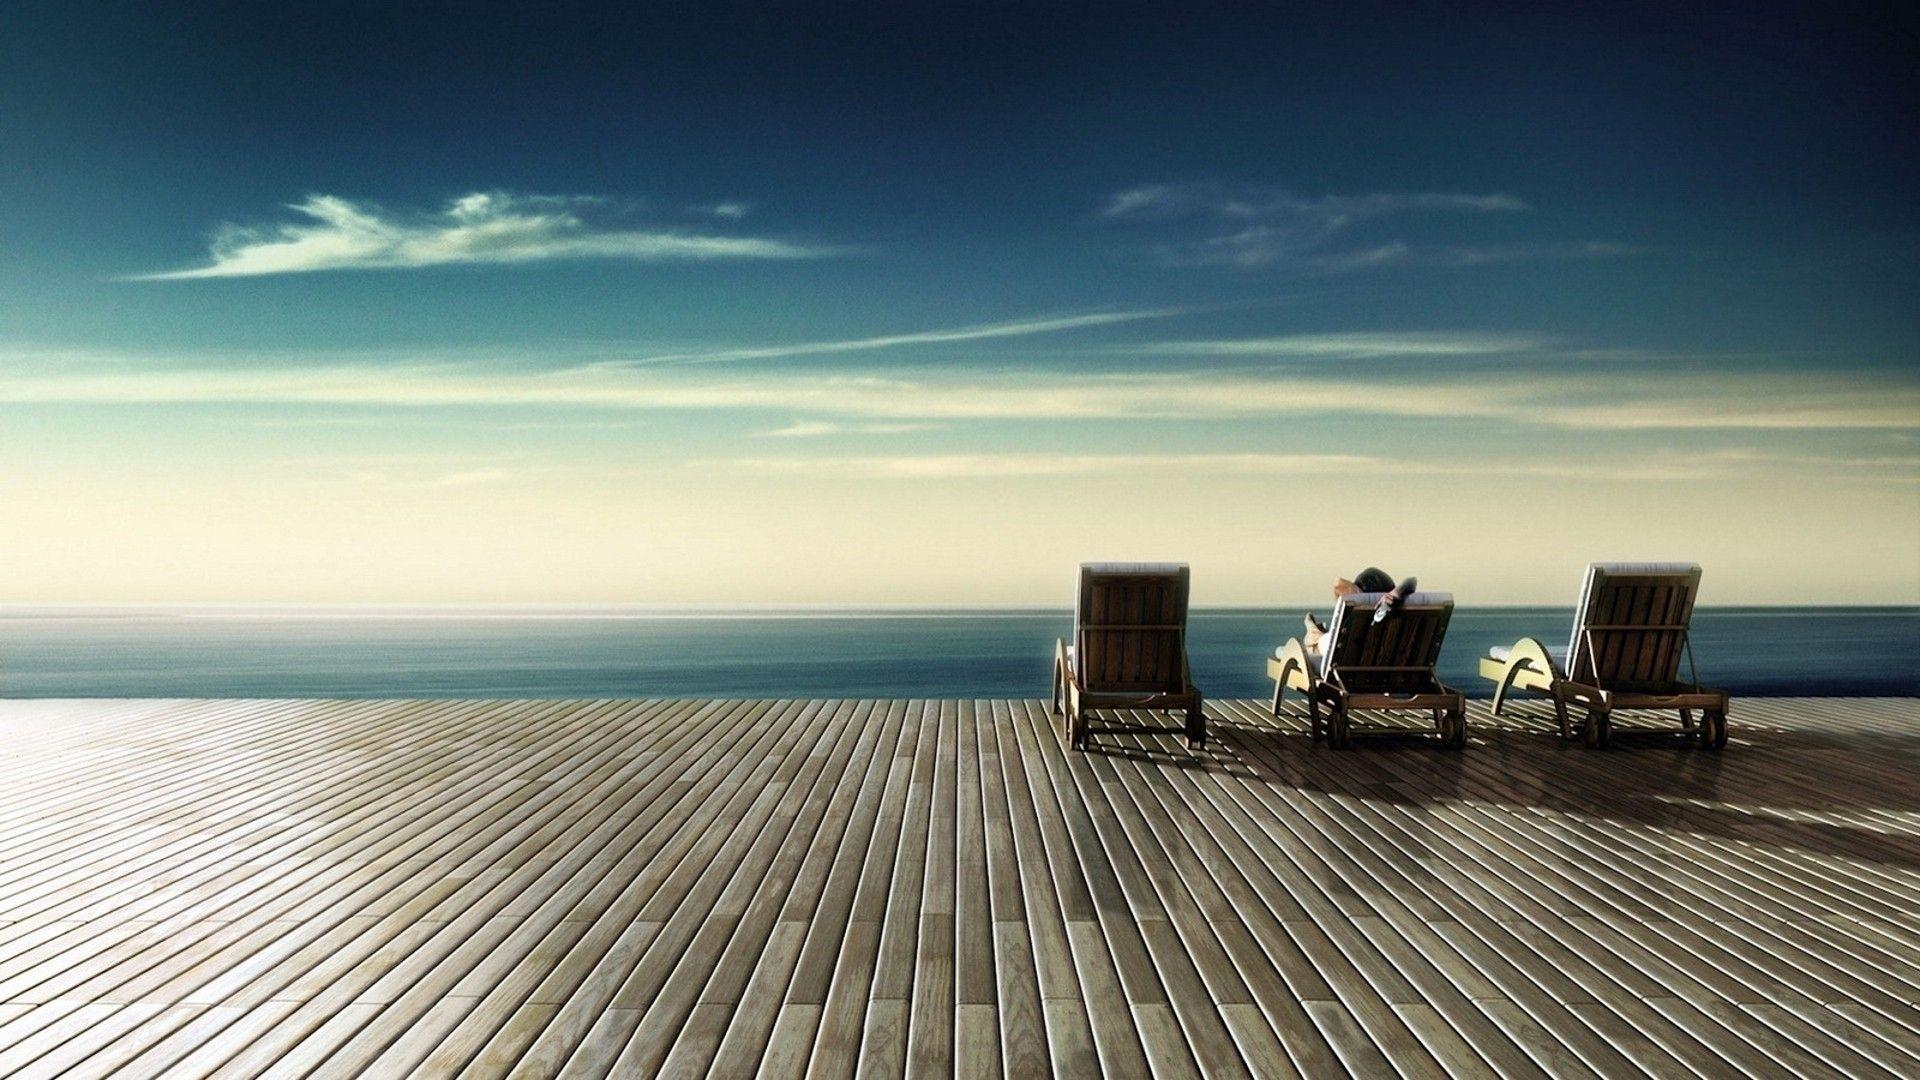 10 Top Relaxing Hd Desktop Wallpaper FULL HD 1920×1080 For